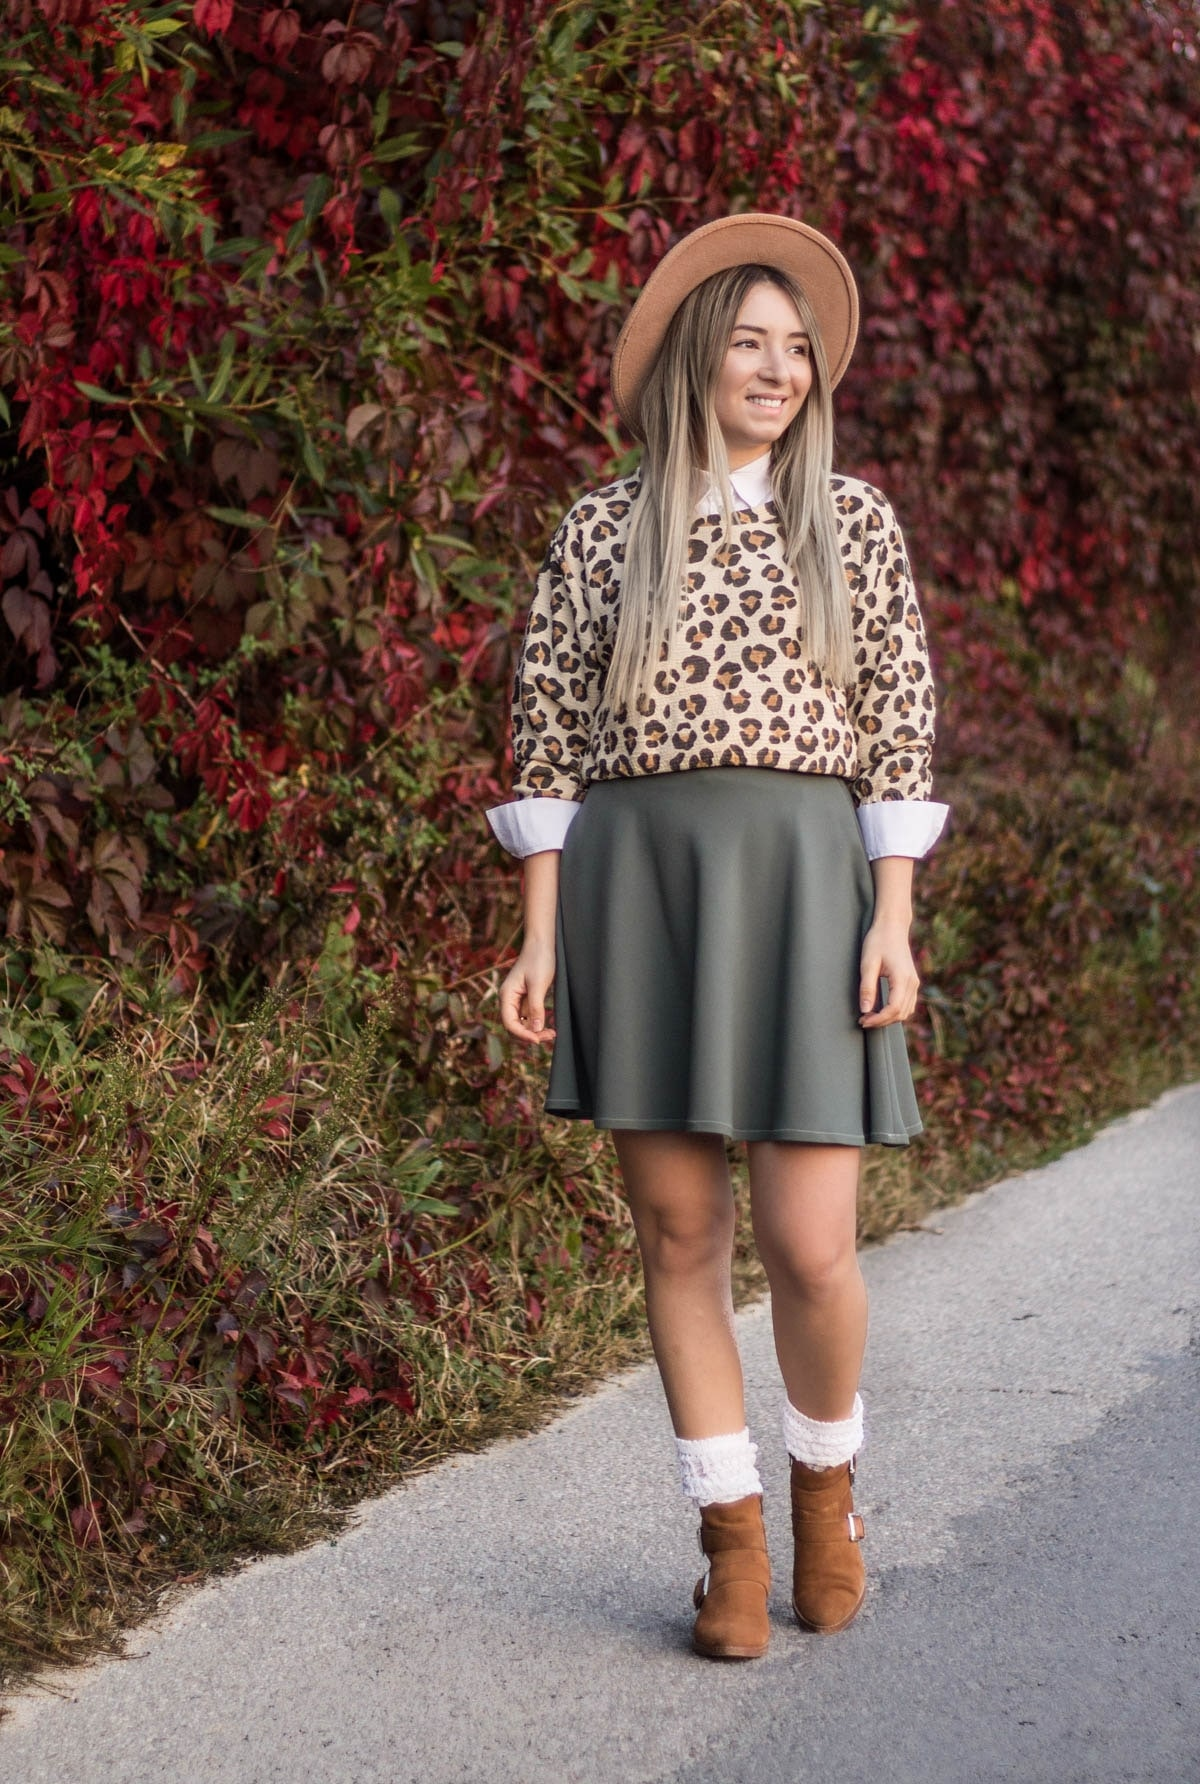 Andreea Ristea - blogger, tinuta peisaj toamna in culori pamantii